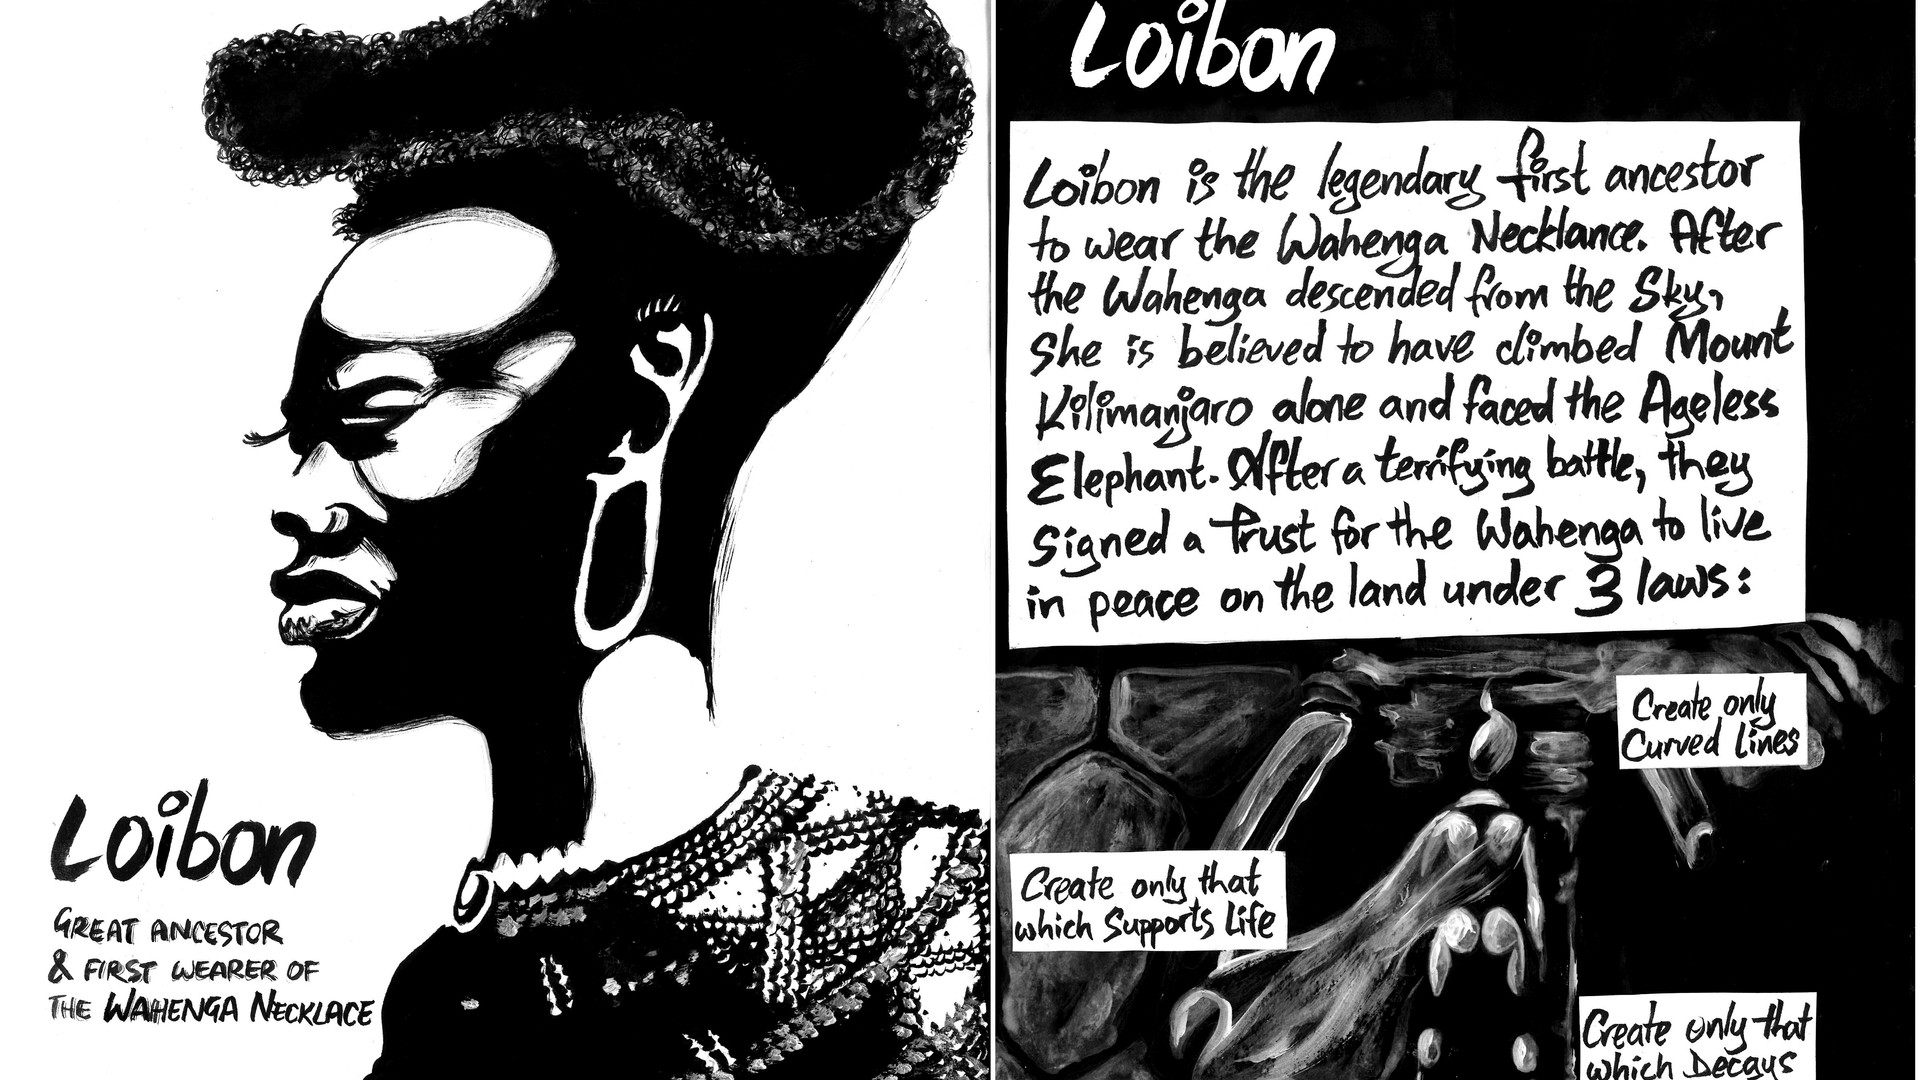 Loibon, The Great Ancestor